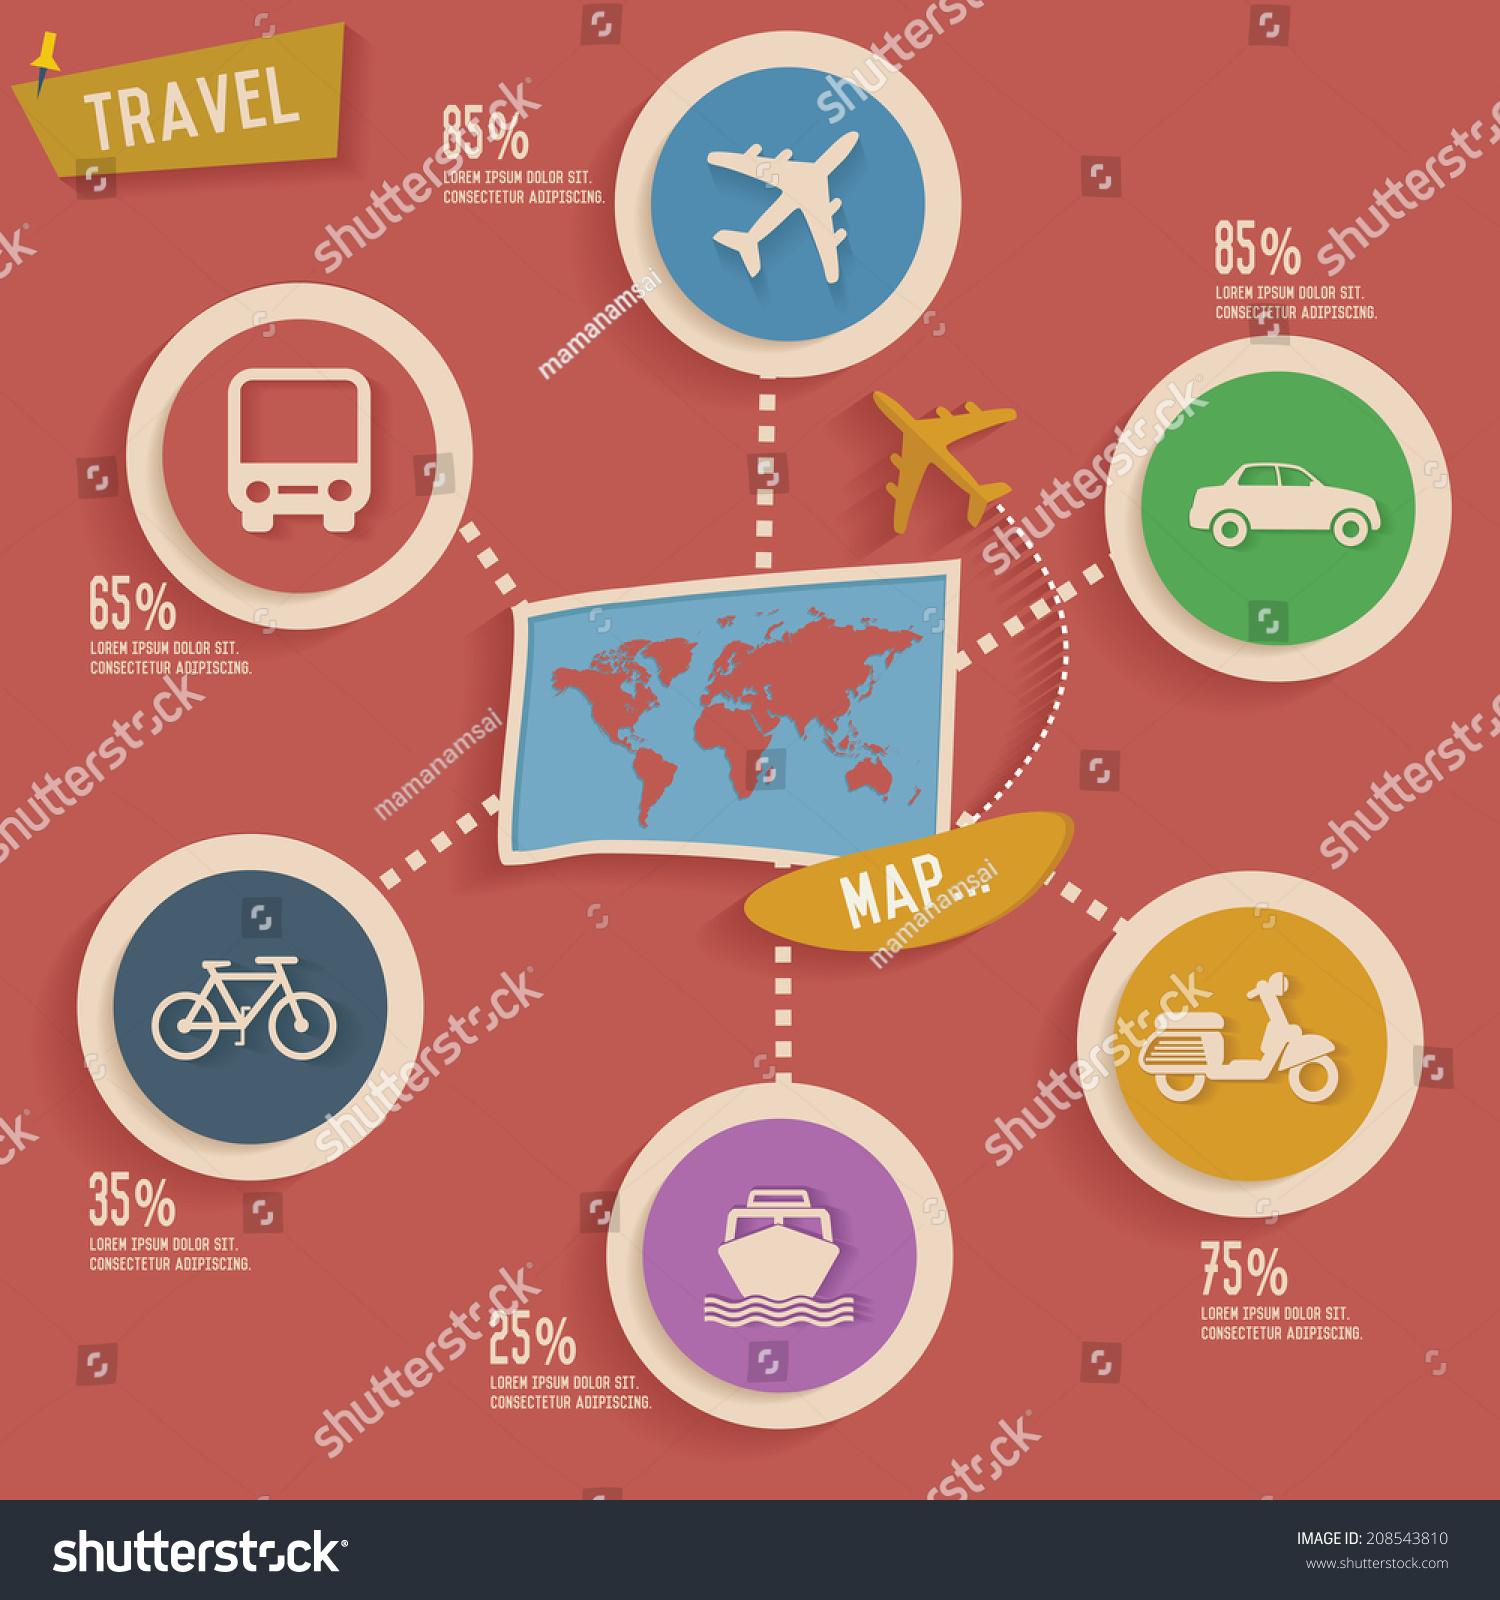 Travel Map Info Graphic Designclean Vector Stock Vector Hd Royalty